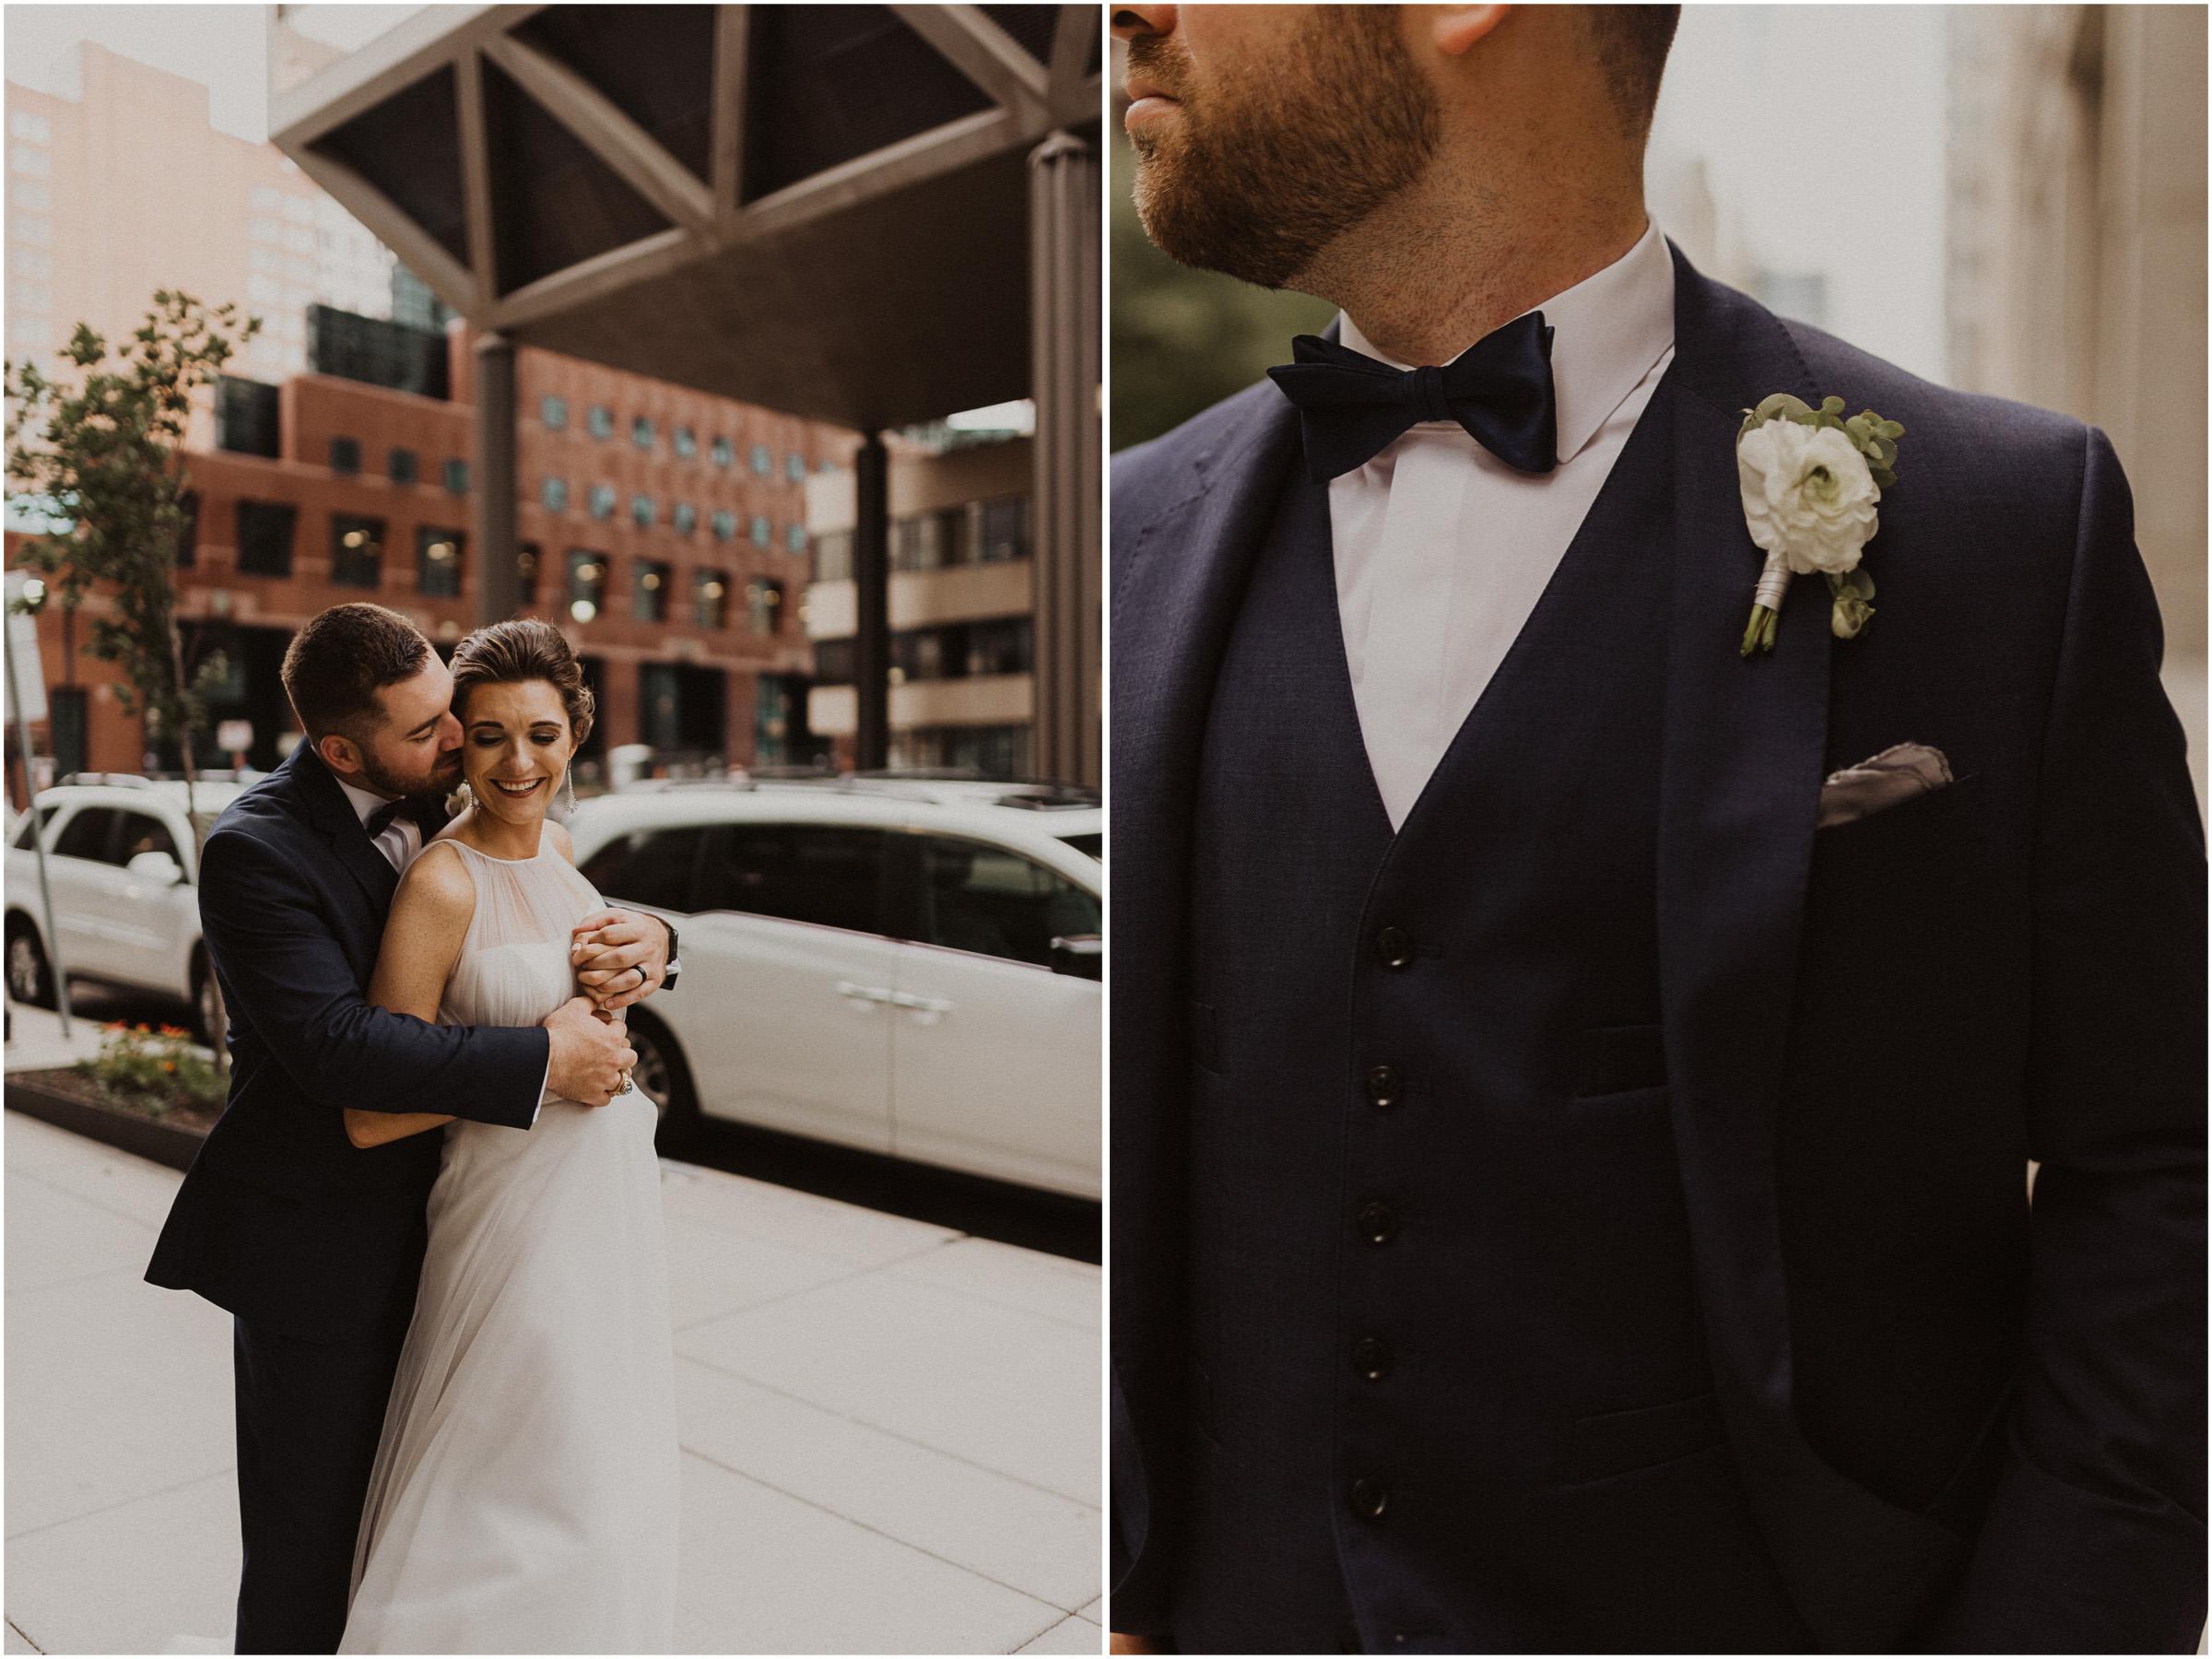 alyssa barletter photography classic downtown kansas city wedding boulevard brewery-52.jpg